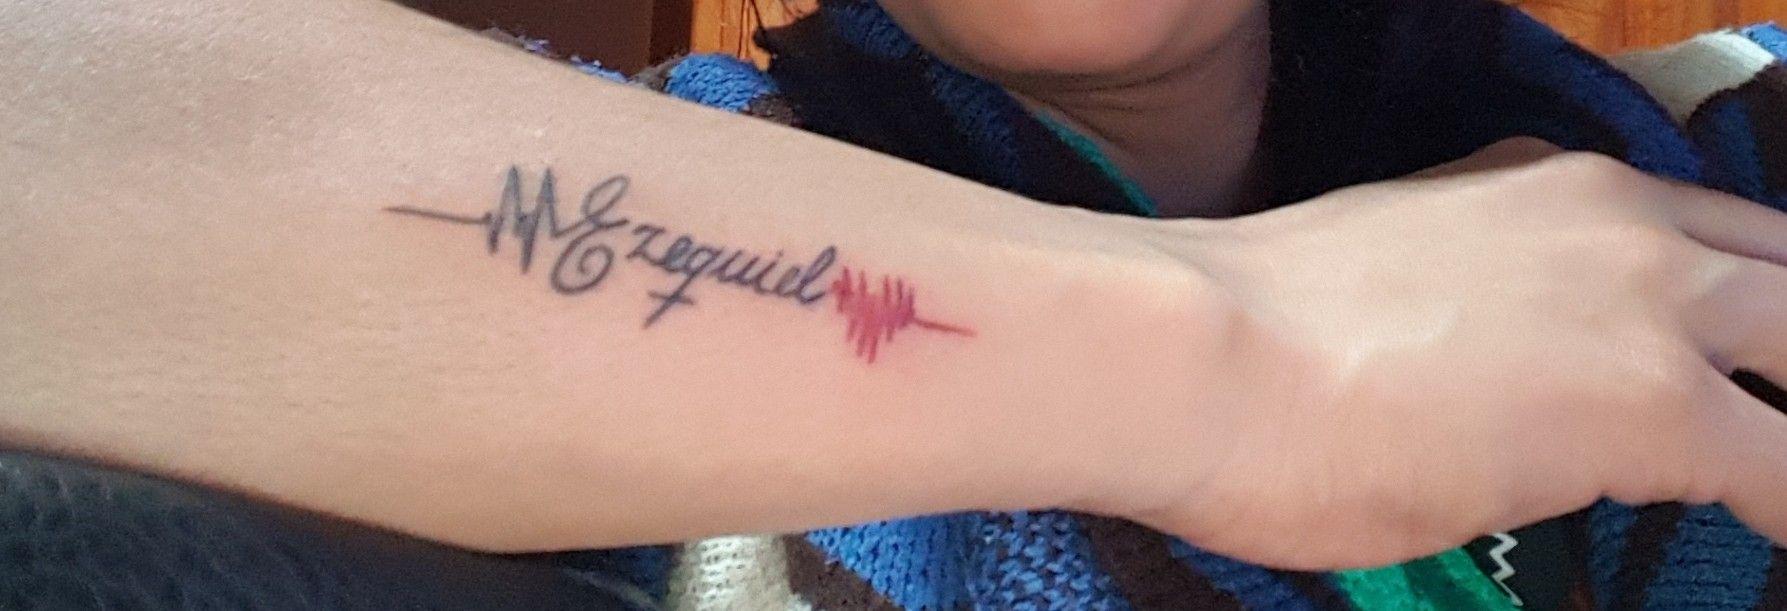 Tatuaje Nombre Lineas Corazon Tatuajes De Nombres Tatuajes